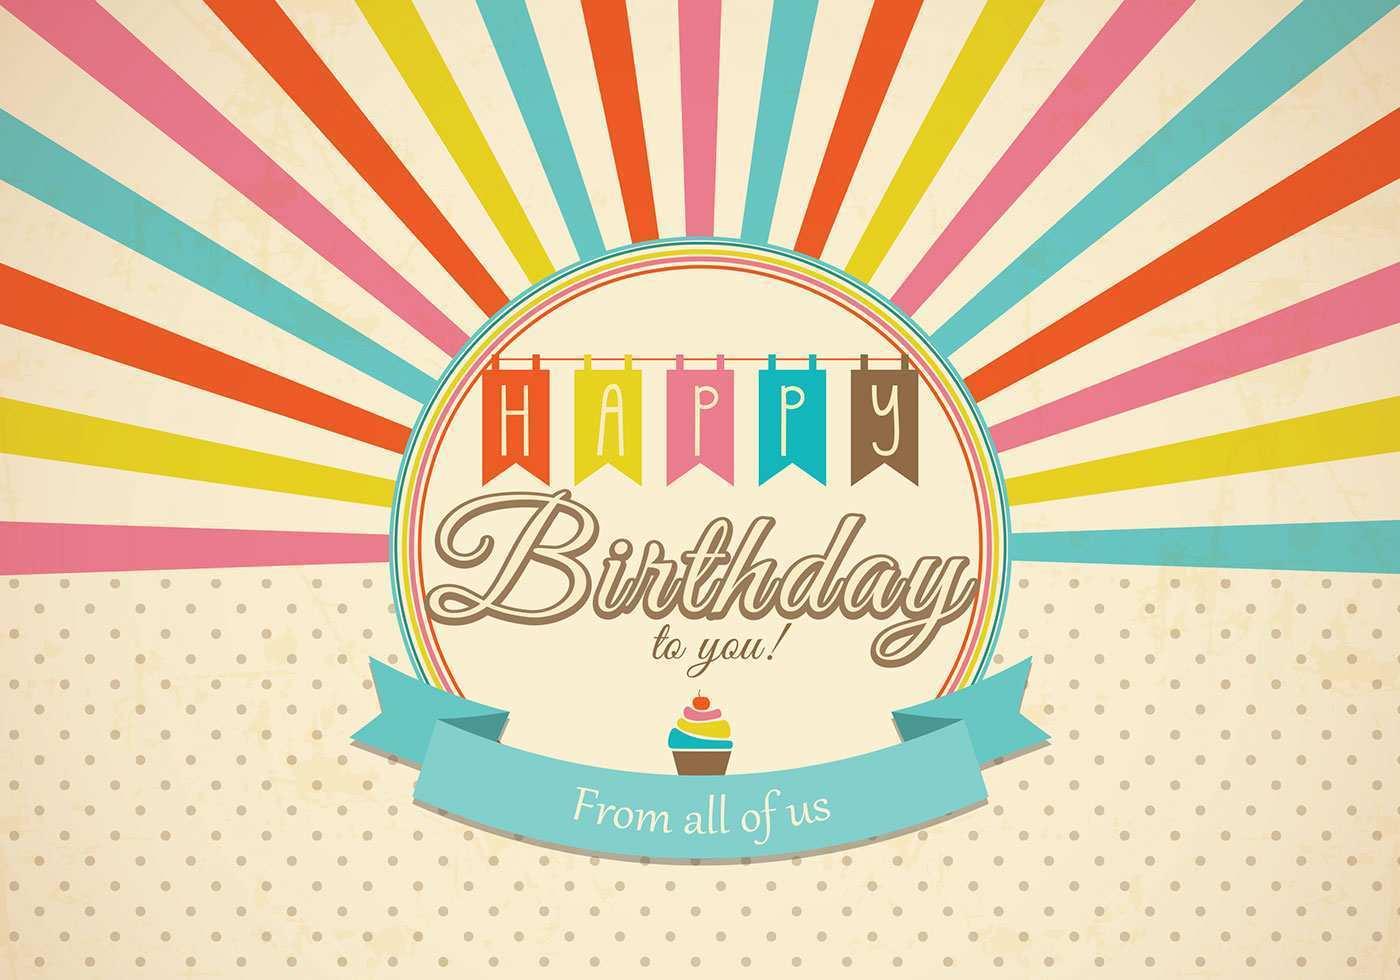 003 Simple Birthday Card Template Photoshop Idea  Greeting Format 4x6 FreeFull